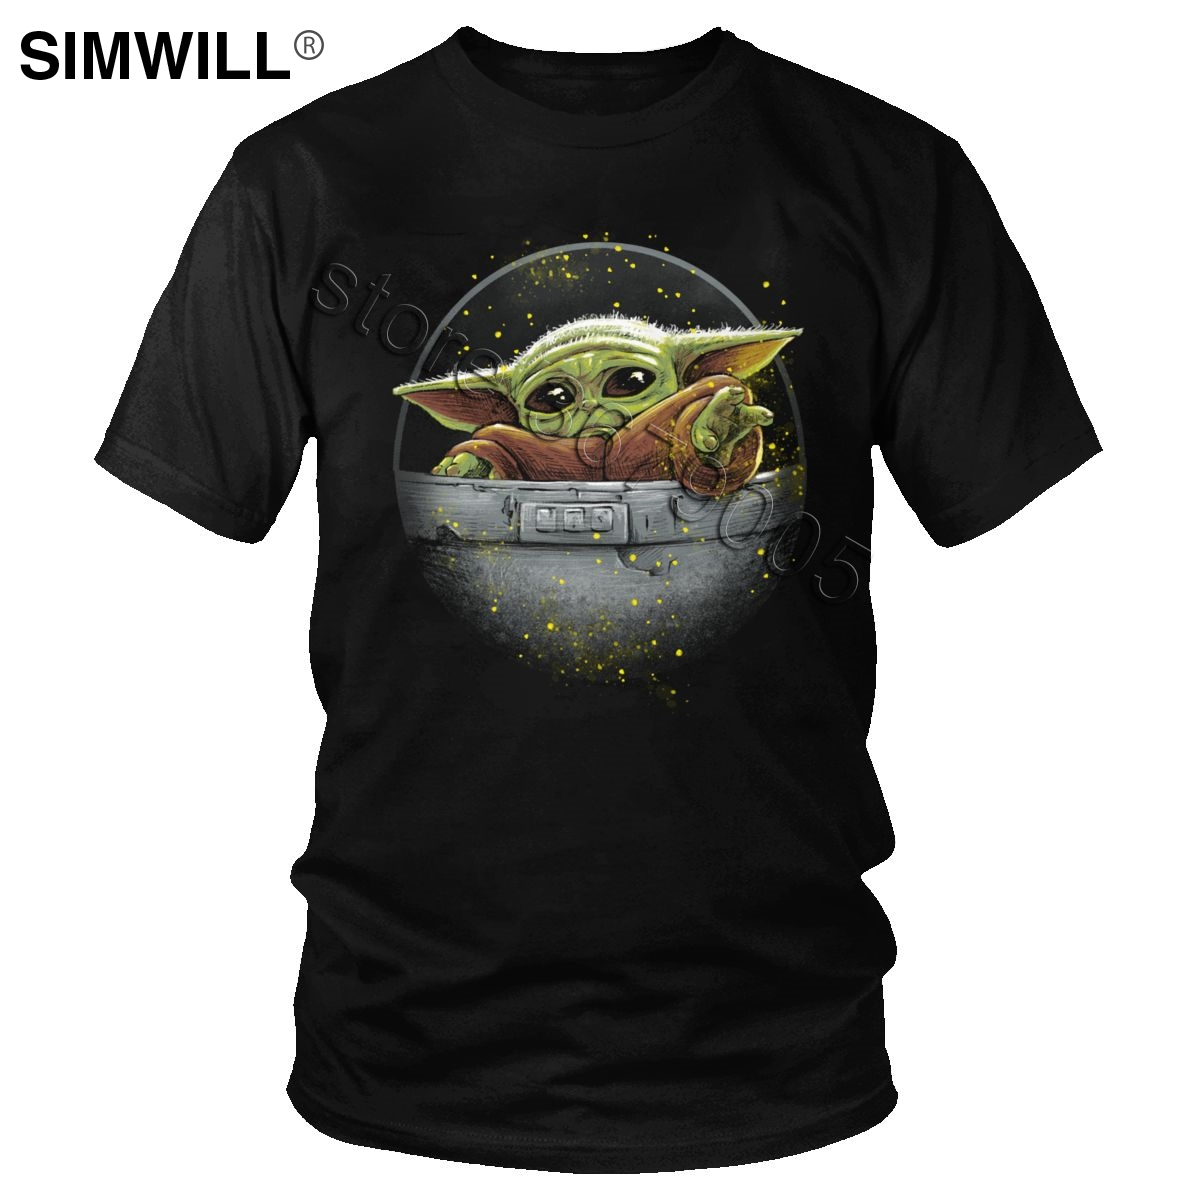 Cute Mandalorian Baby Yoda T Shirt Men Kawaii Printed Cotton T-shirts Crew Neck Short Sleeved Star Wars Tee Tops Gift Apparel